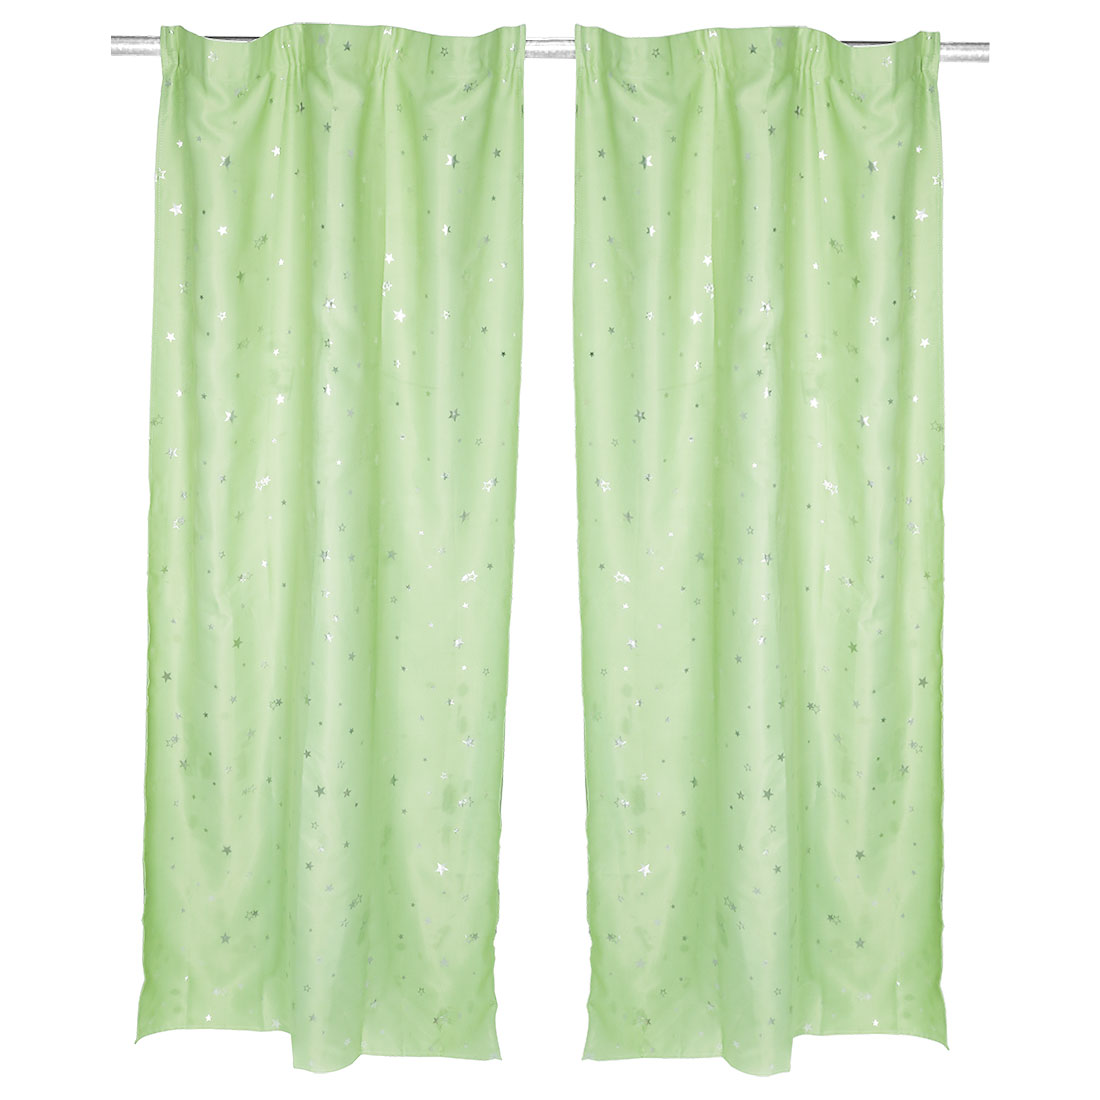 Living Room Star Pattern Decorative Panel Window Sheer Curtain Green 100 x 200cm